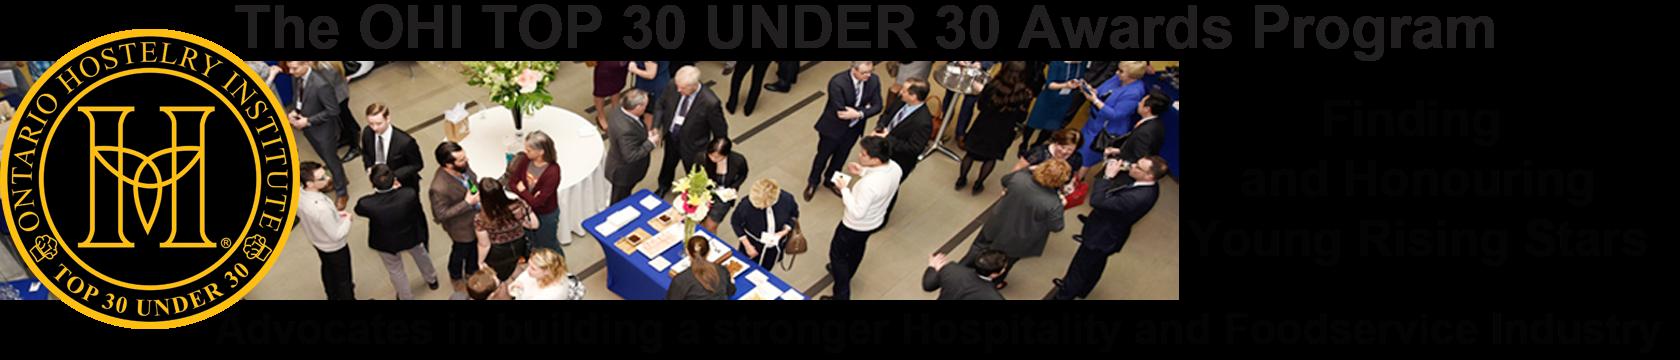 top-30-under-30